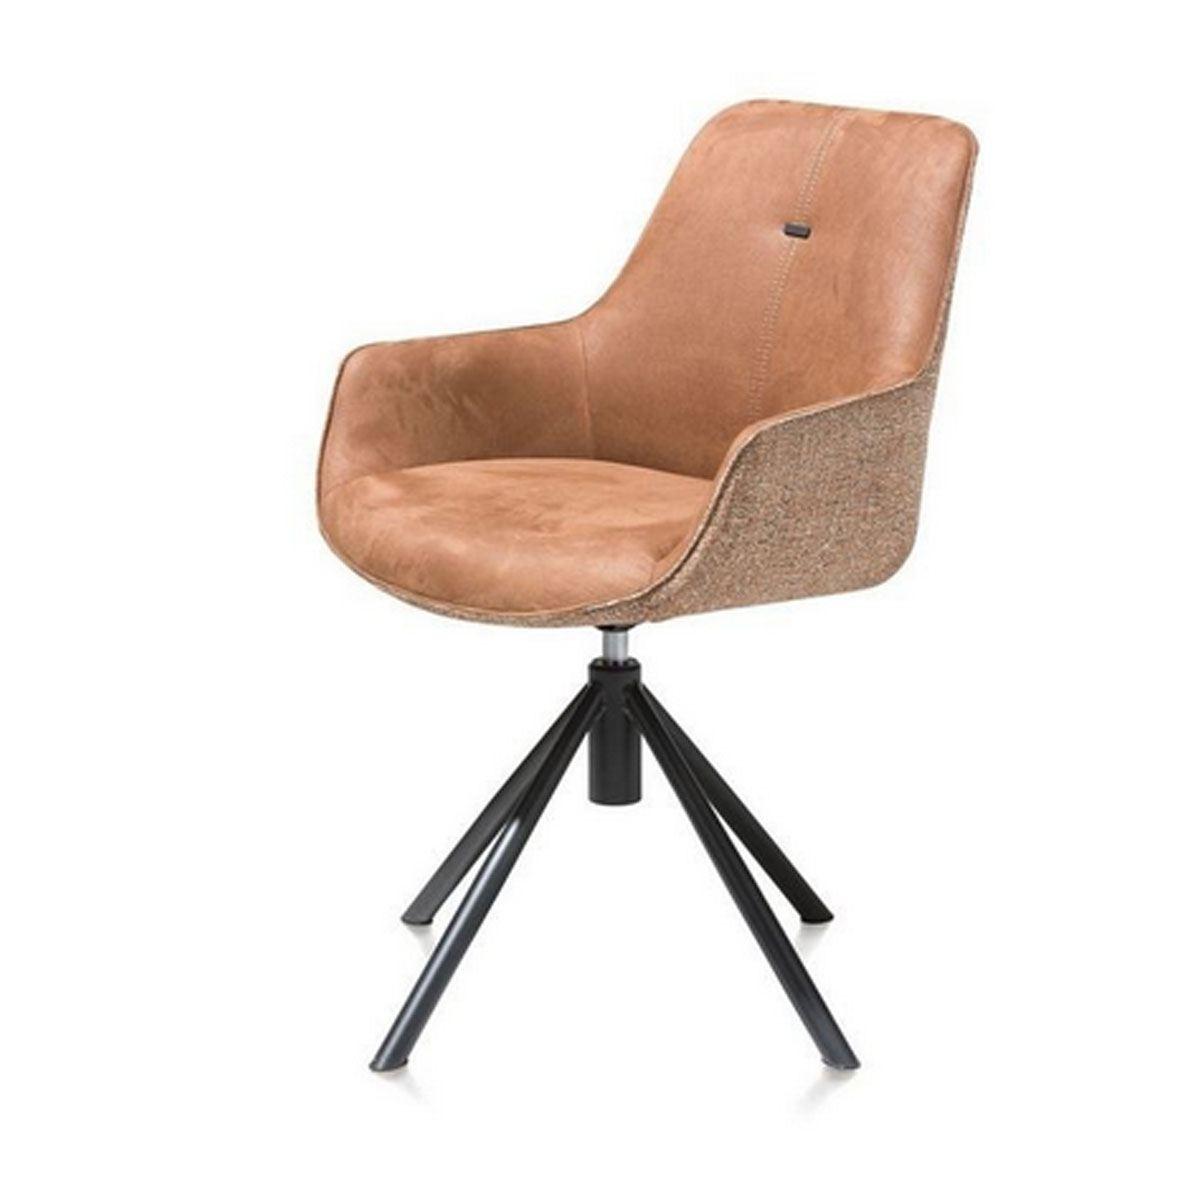 habufa jill drehstuhl mit metallgestell und armlehne farbausf hrung w hlbar f r ihr esszimmer